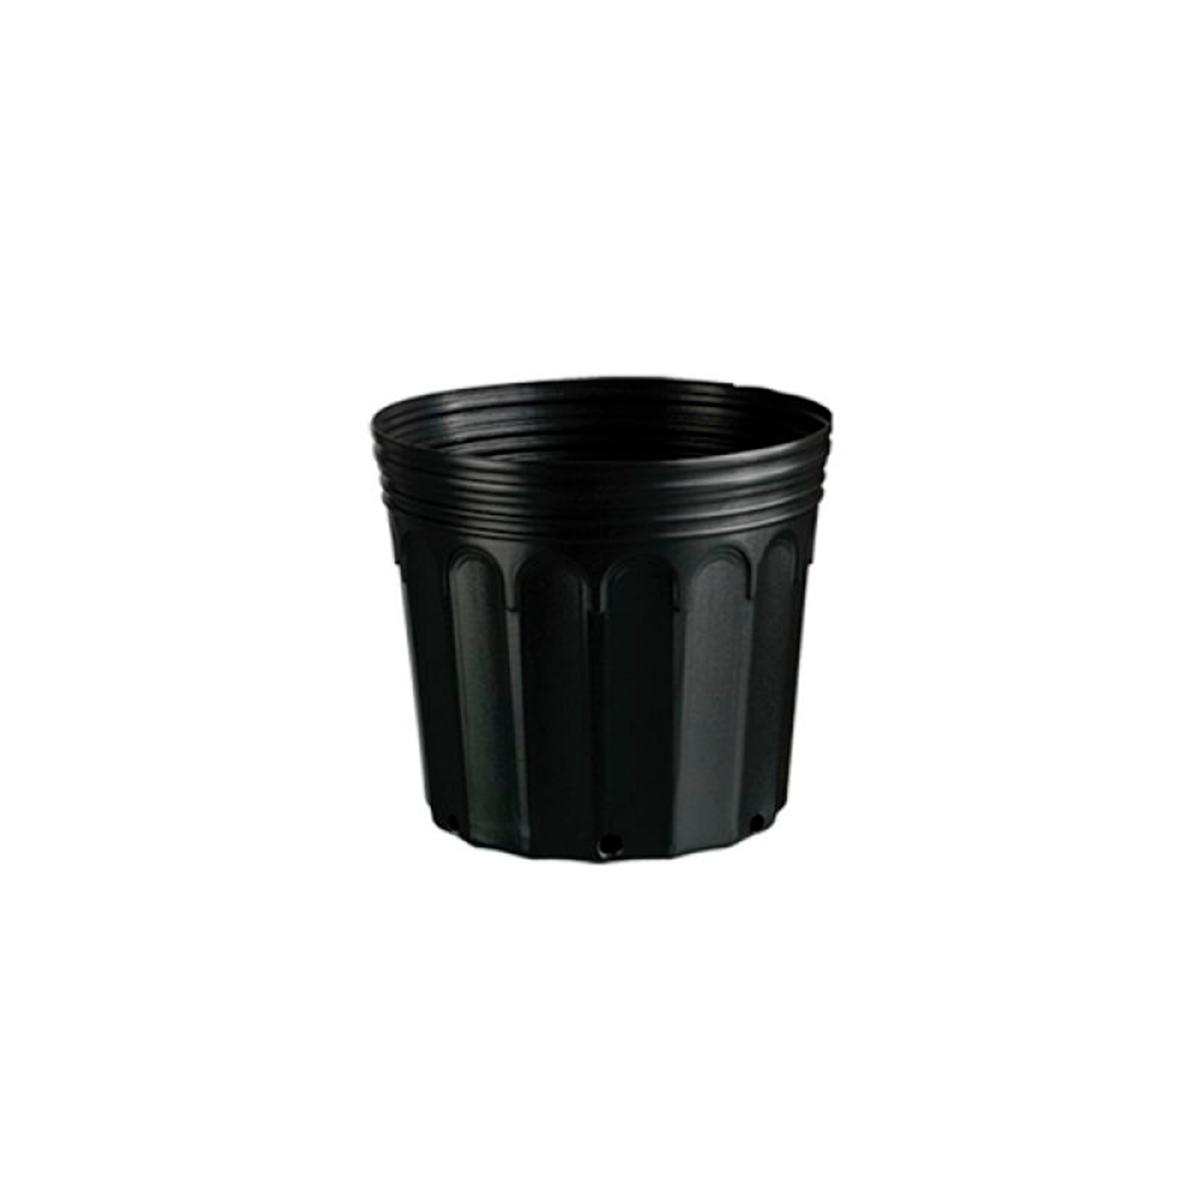 Kit 150 Embalagem Vaso para Mudas Plástico 3,6L